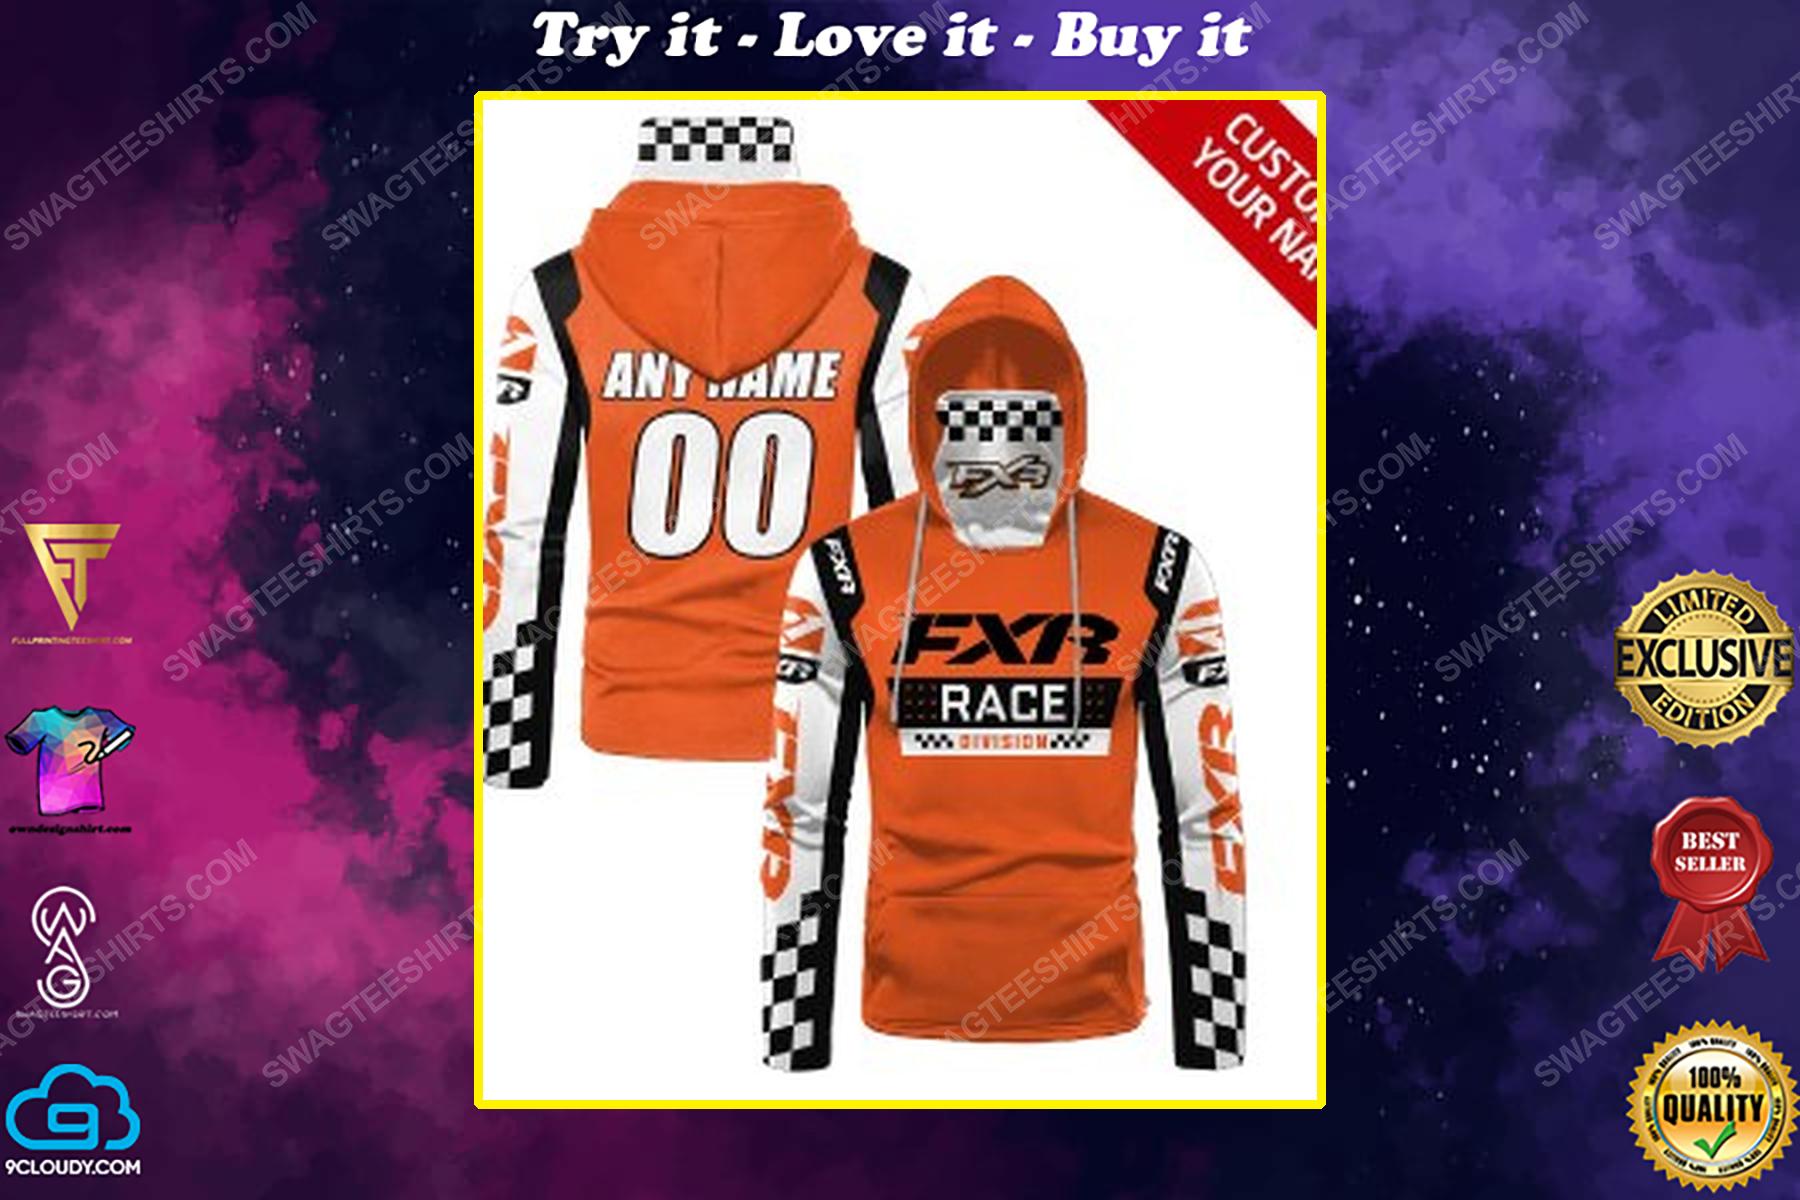 Custom name fxr race division full print mask hoodie